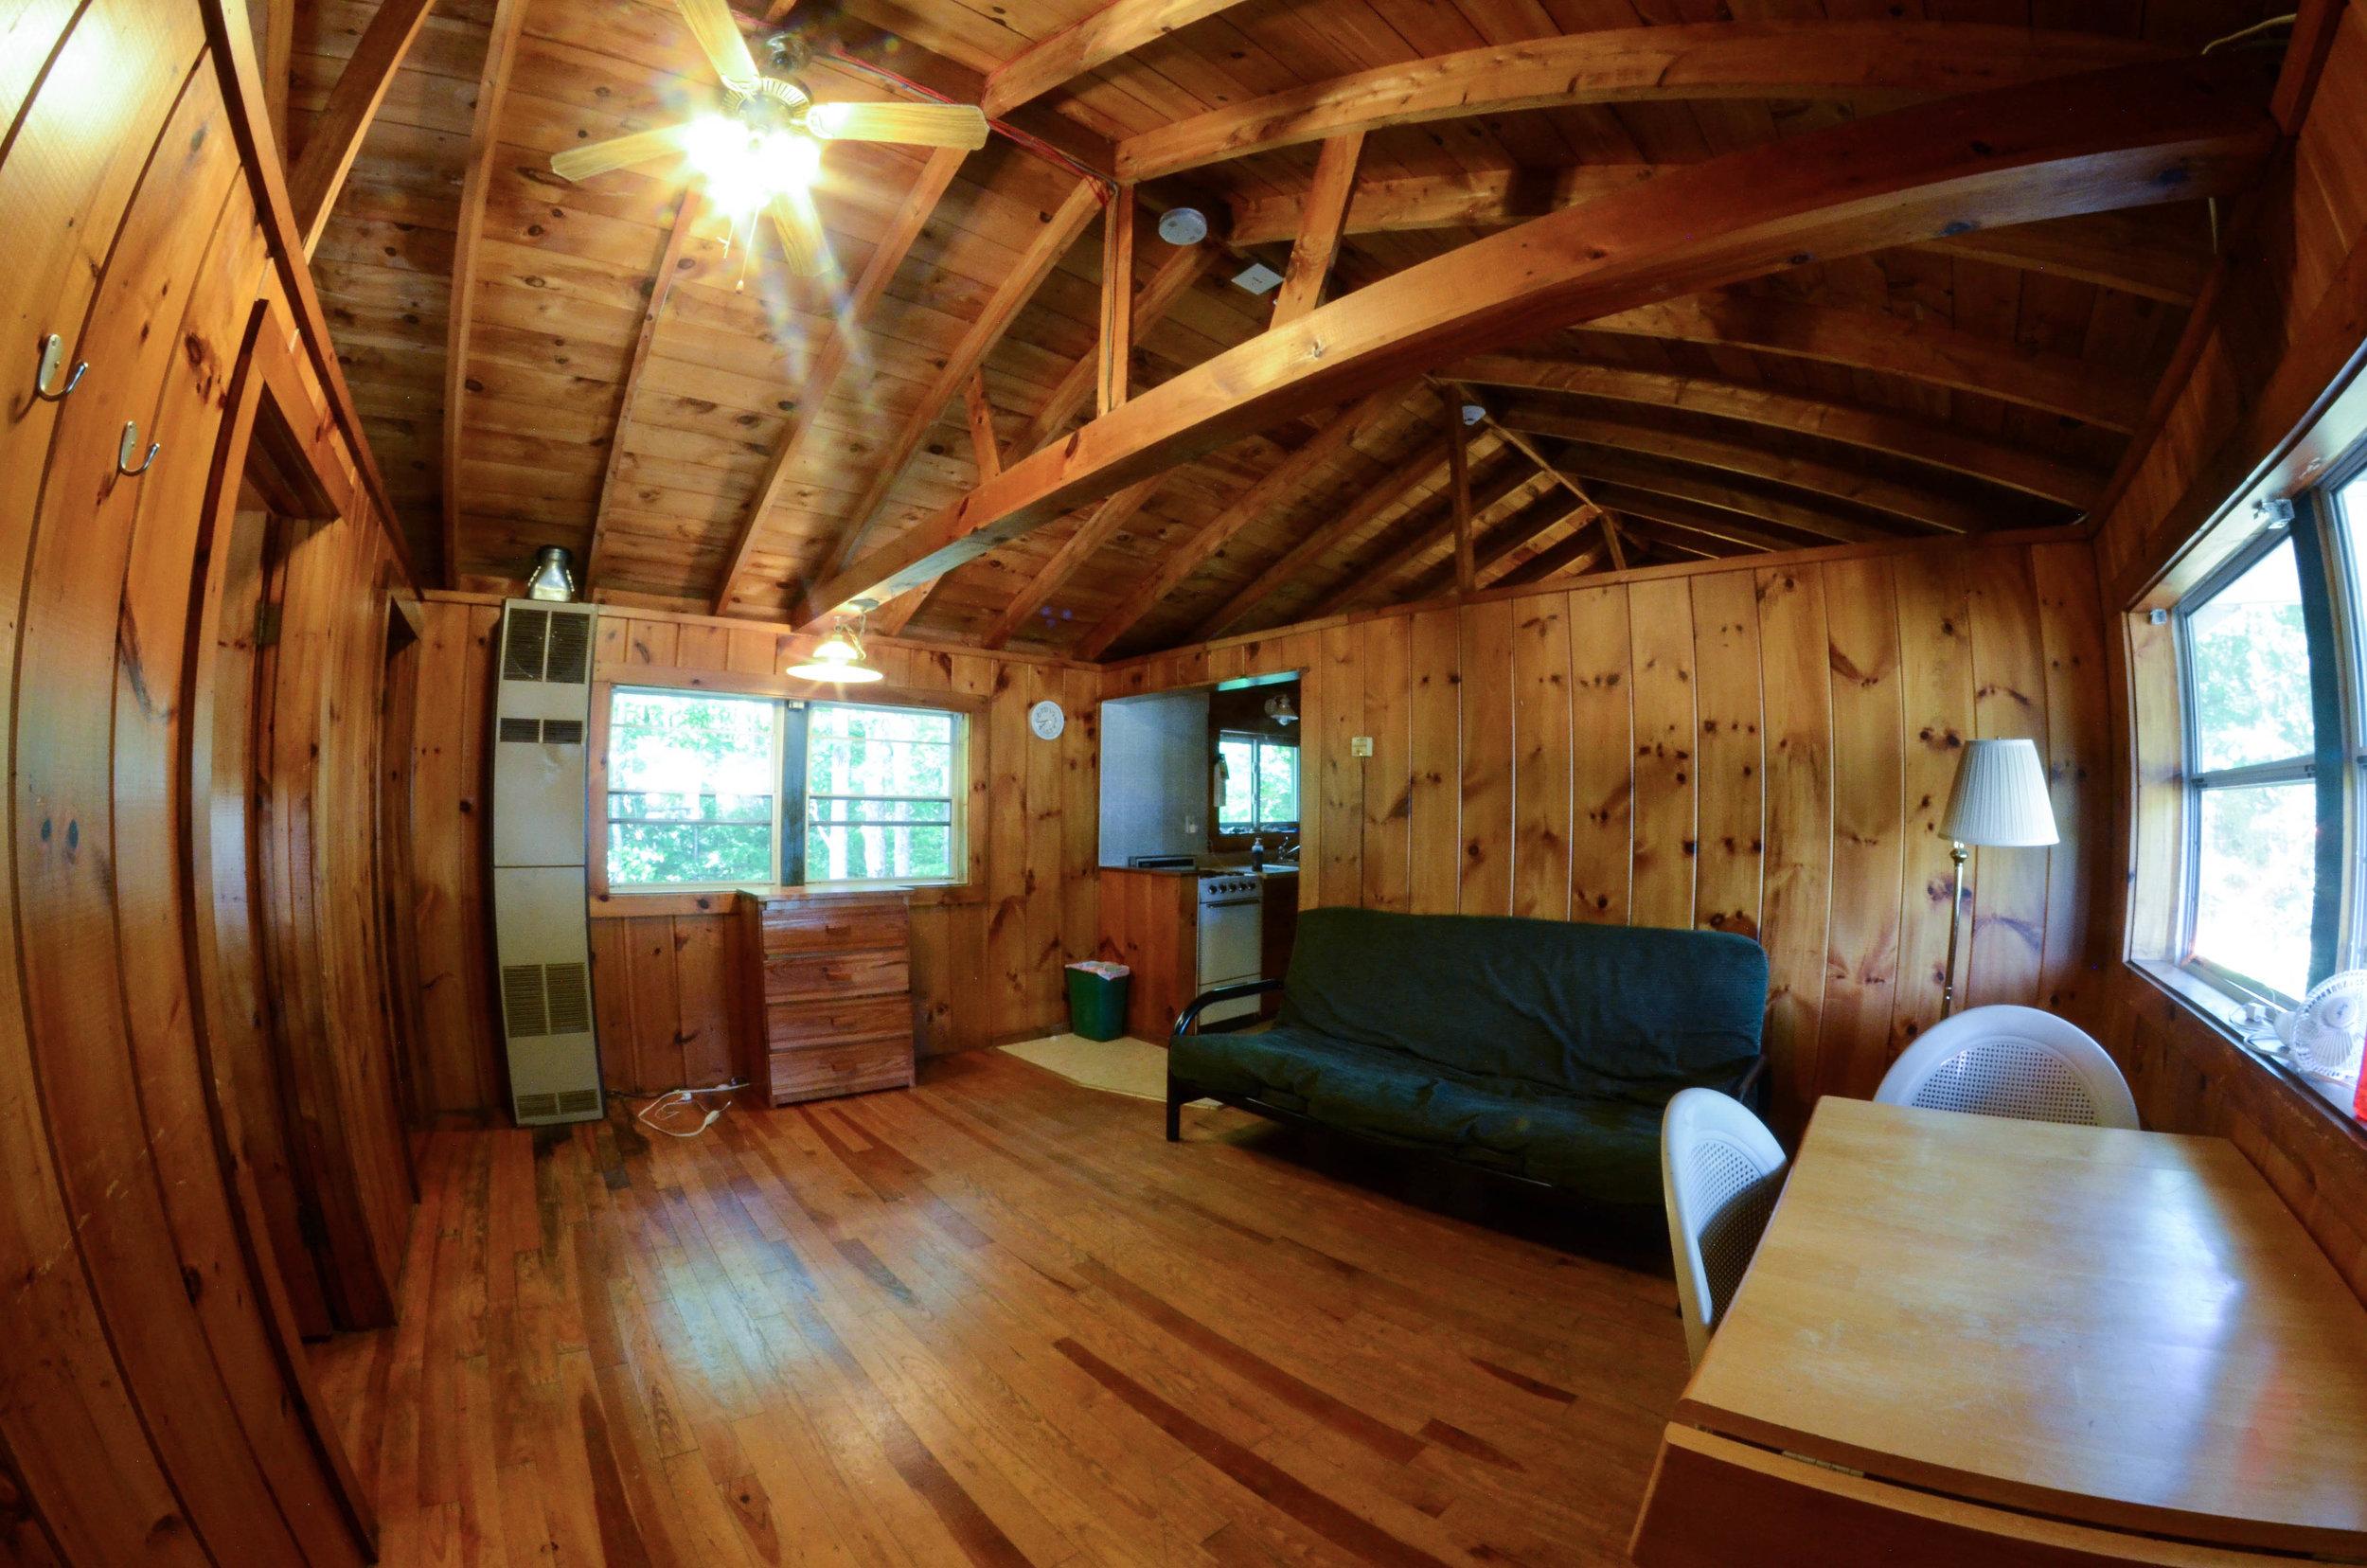 Rental Property Cabin Interior New Hampshire